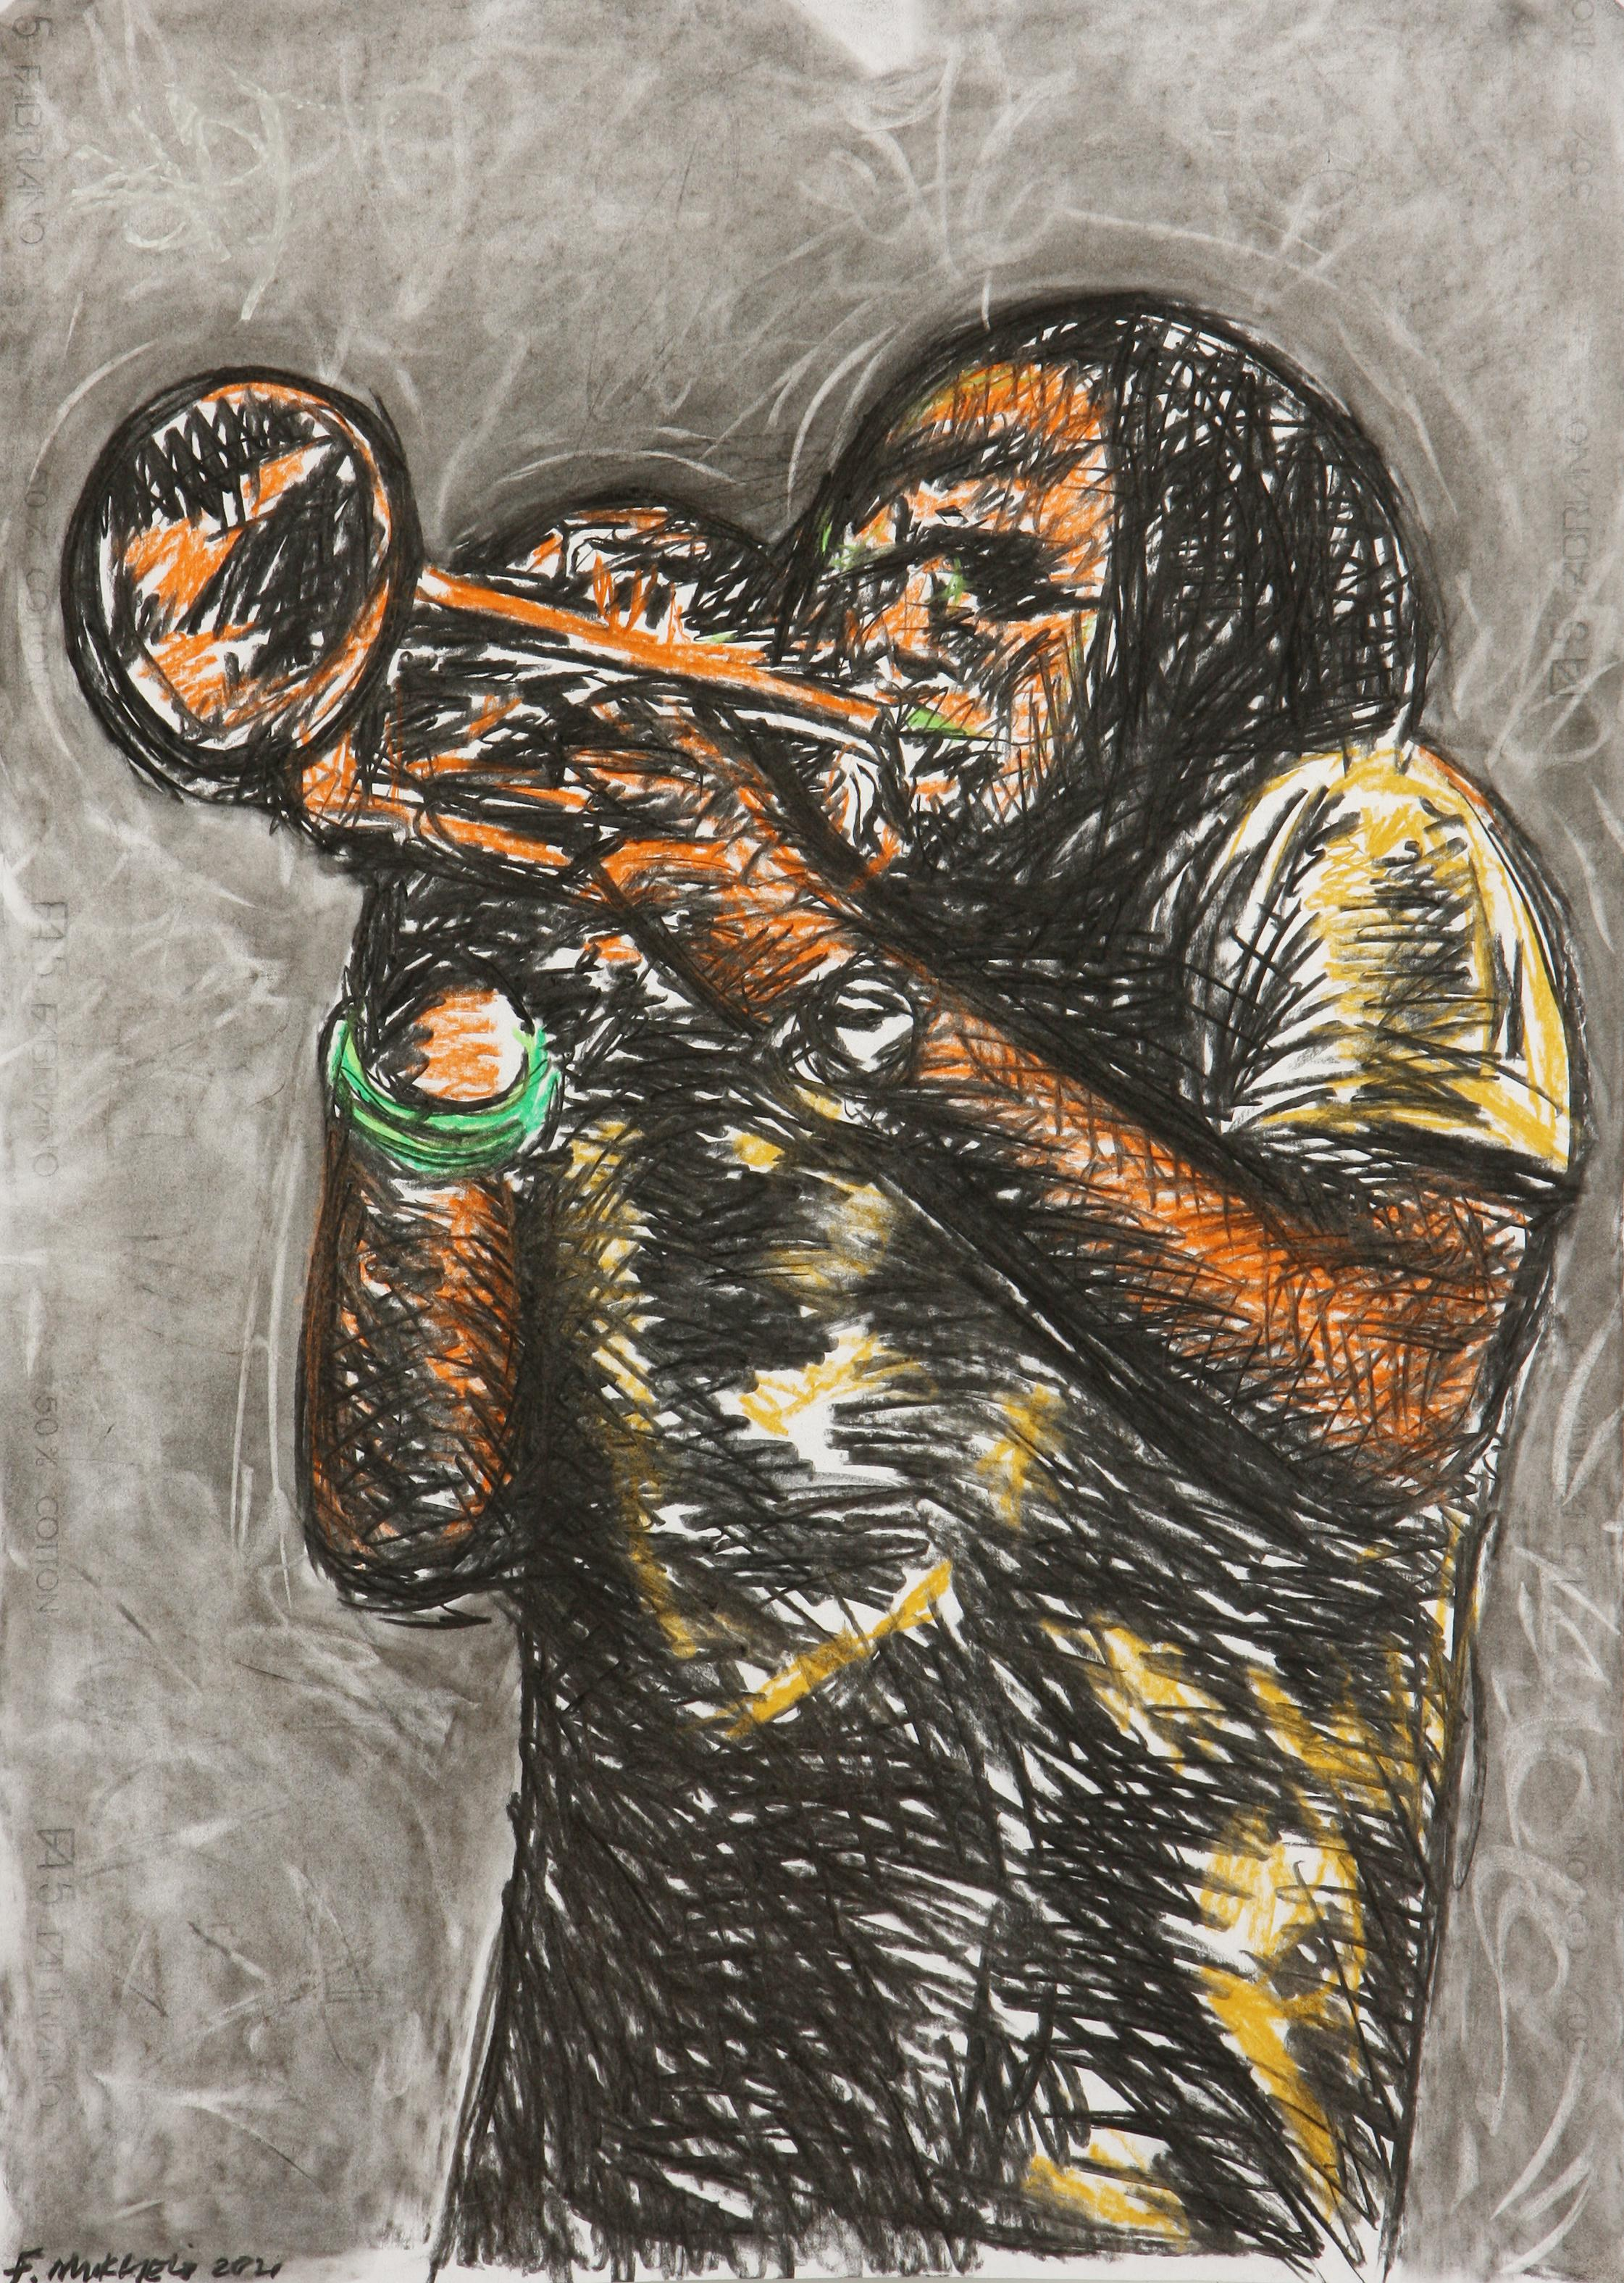 Fhatuwani Mukheli (South Africa 1985-) The African Symphony, 2021